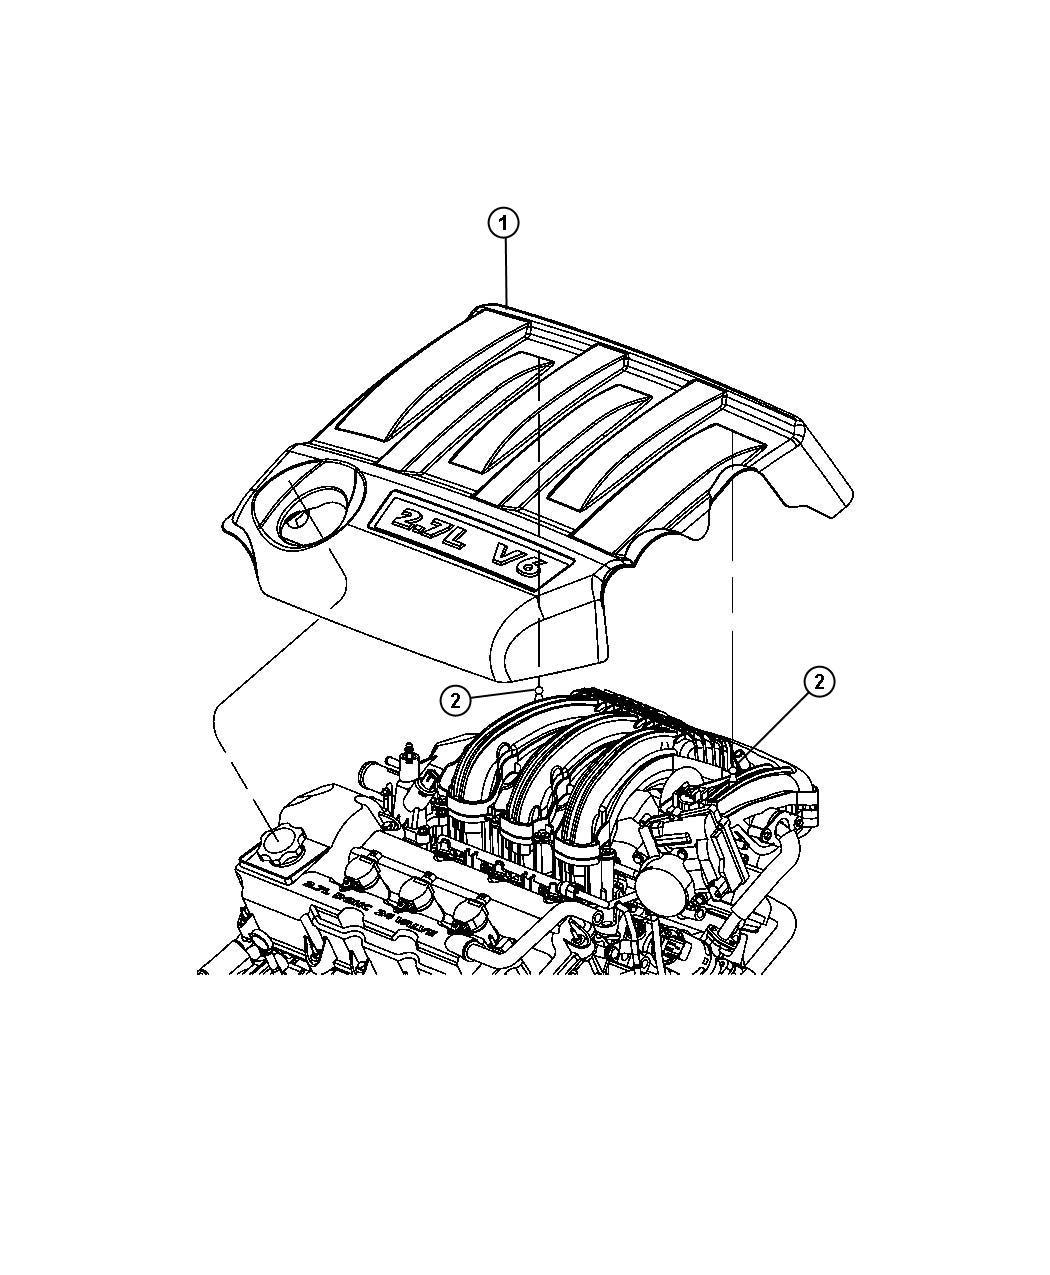 2007 Dodge Avenger Cover. Engine. Export rhd. Eer